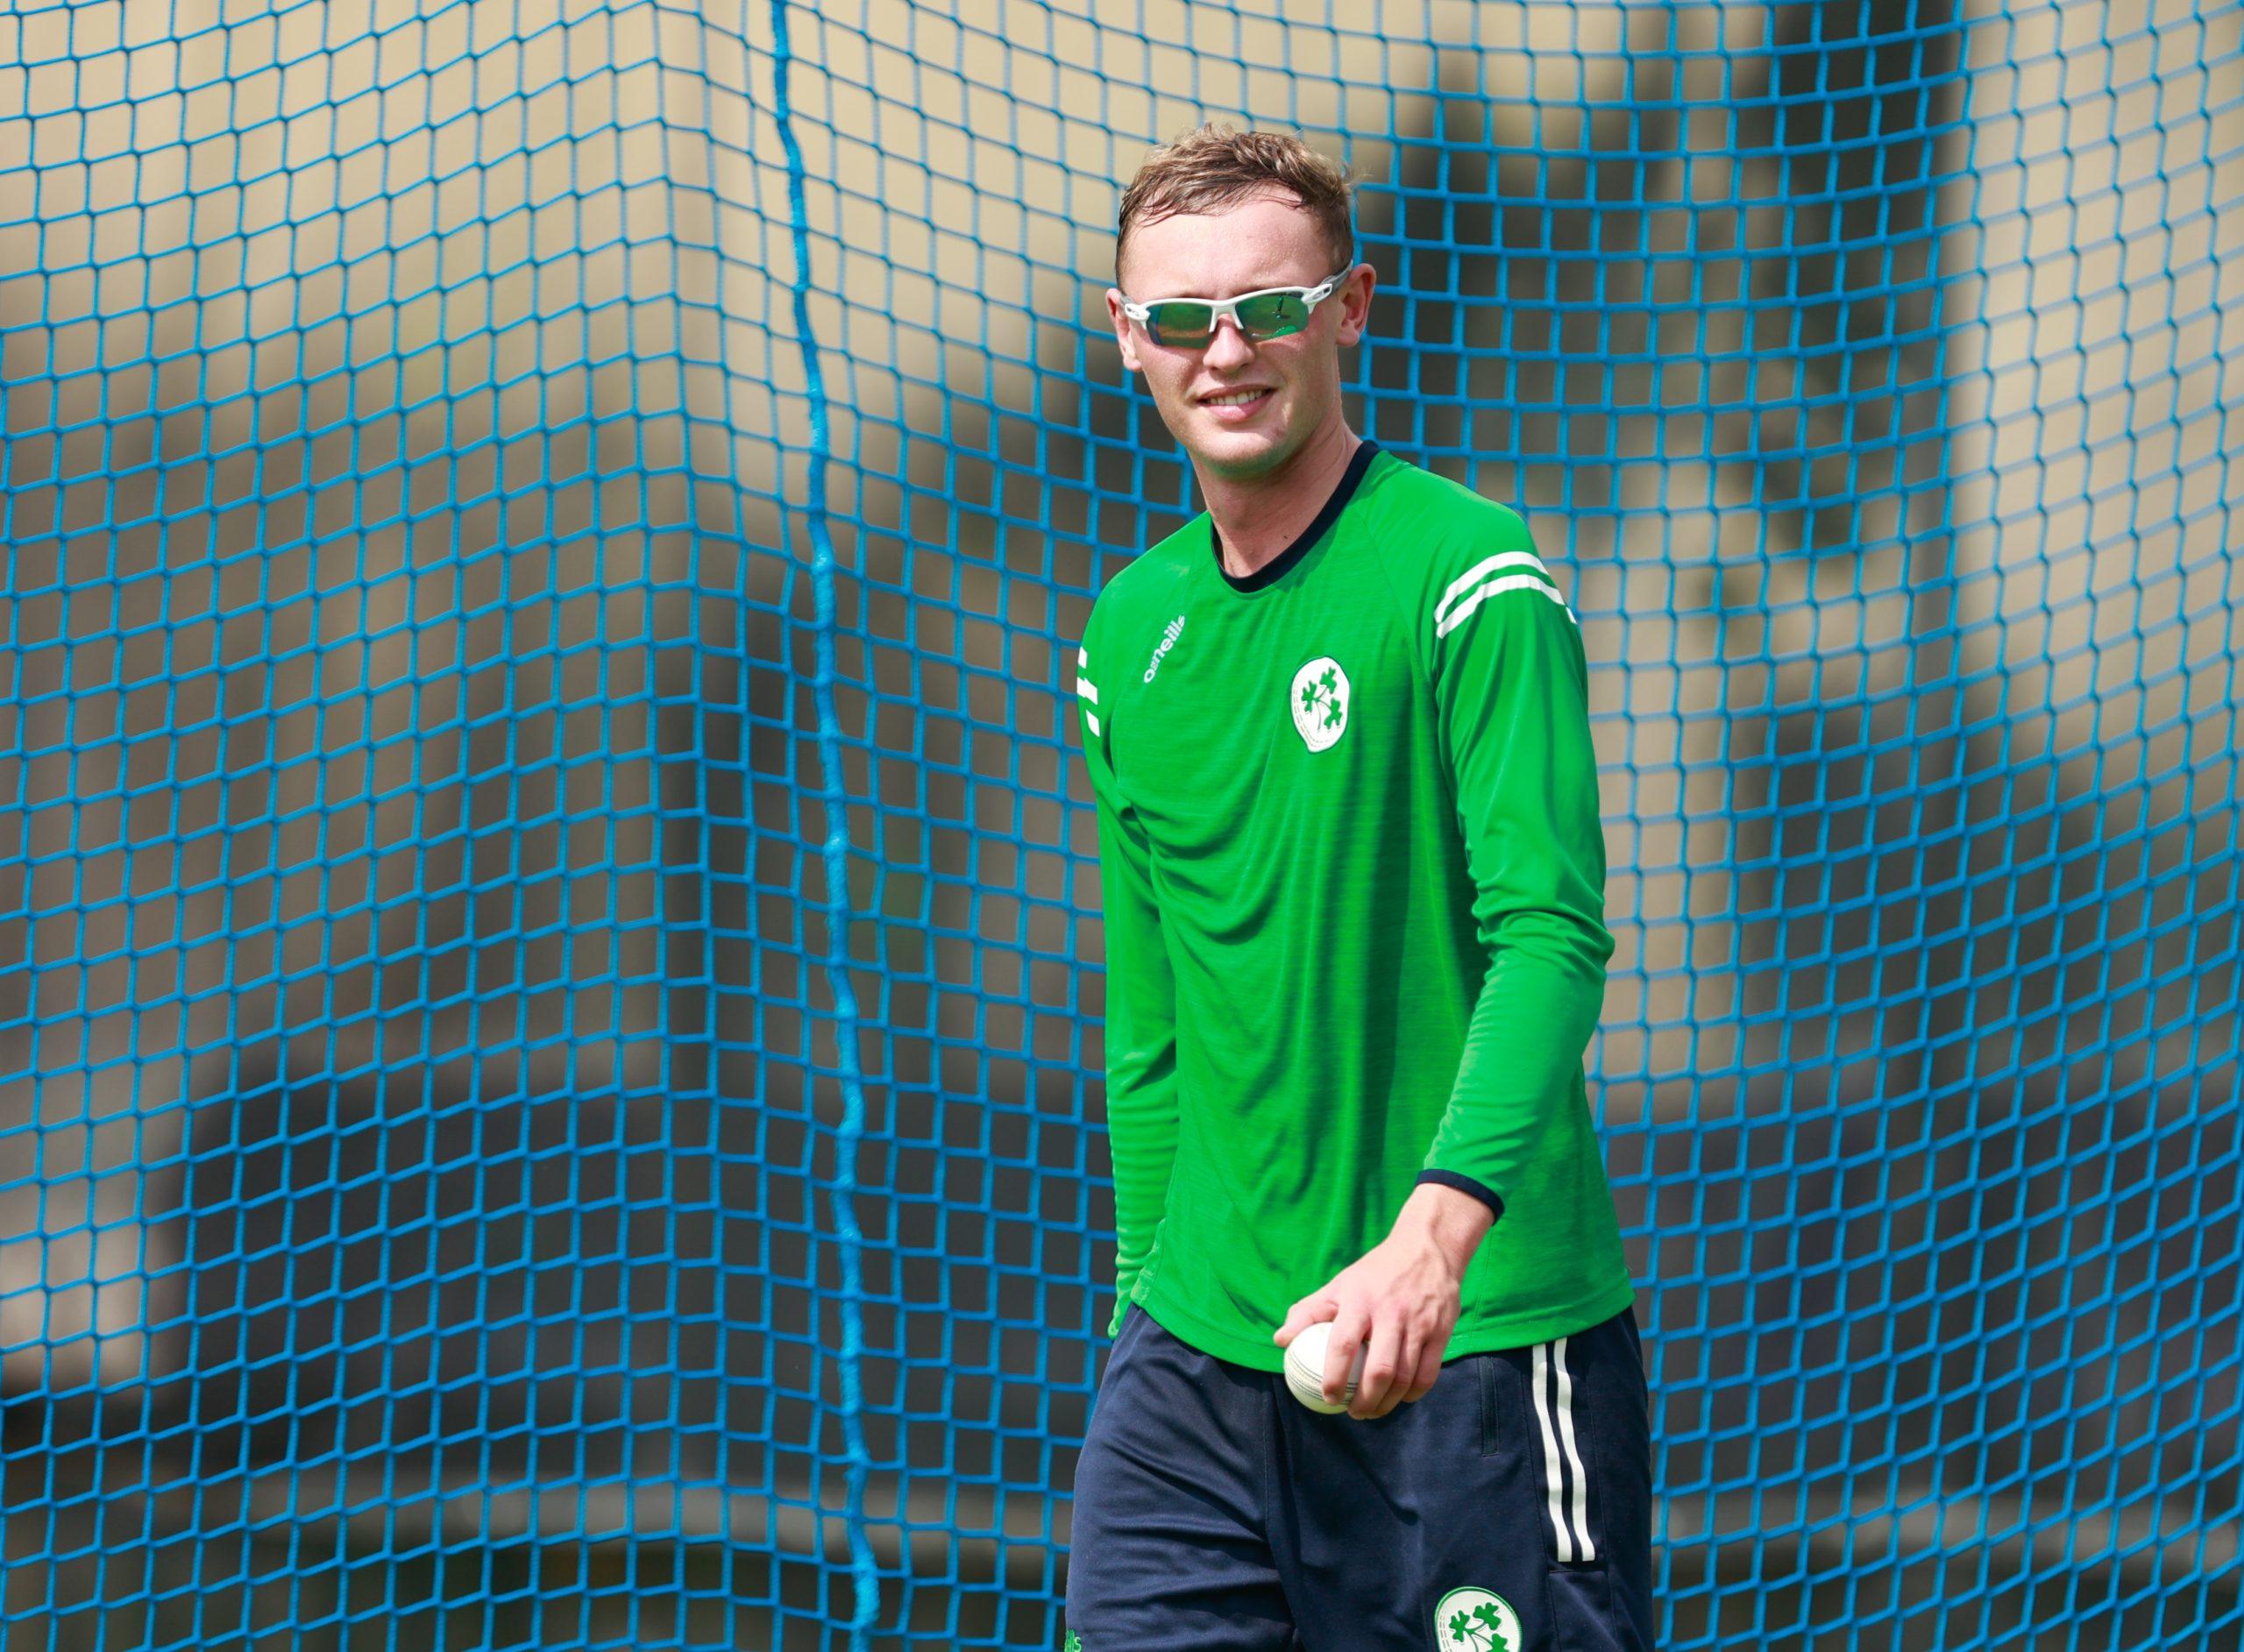 Cricket Ireland: Ben White relishing cricket life ahead of Men's T20 World Cup